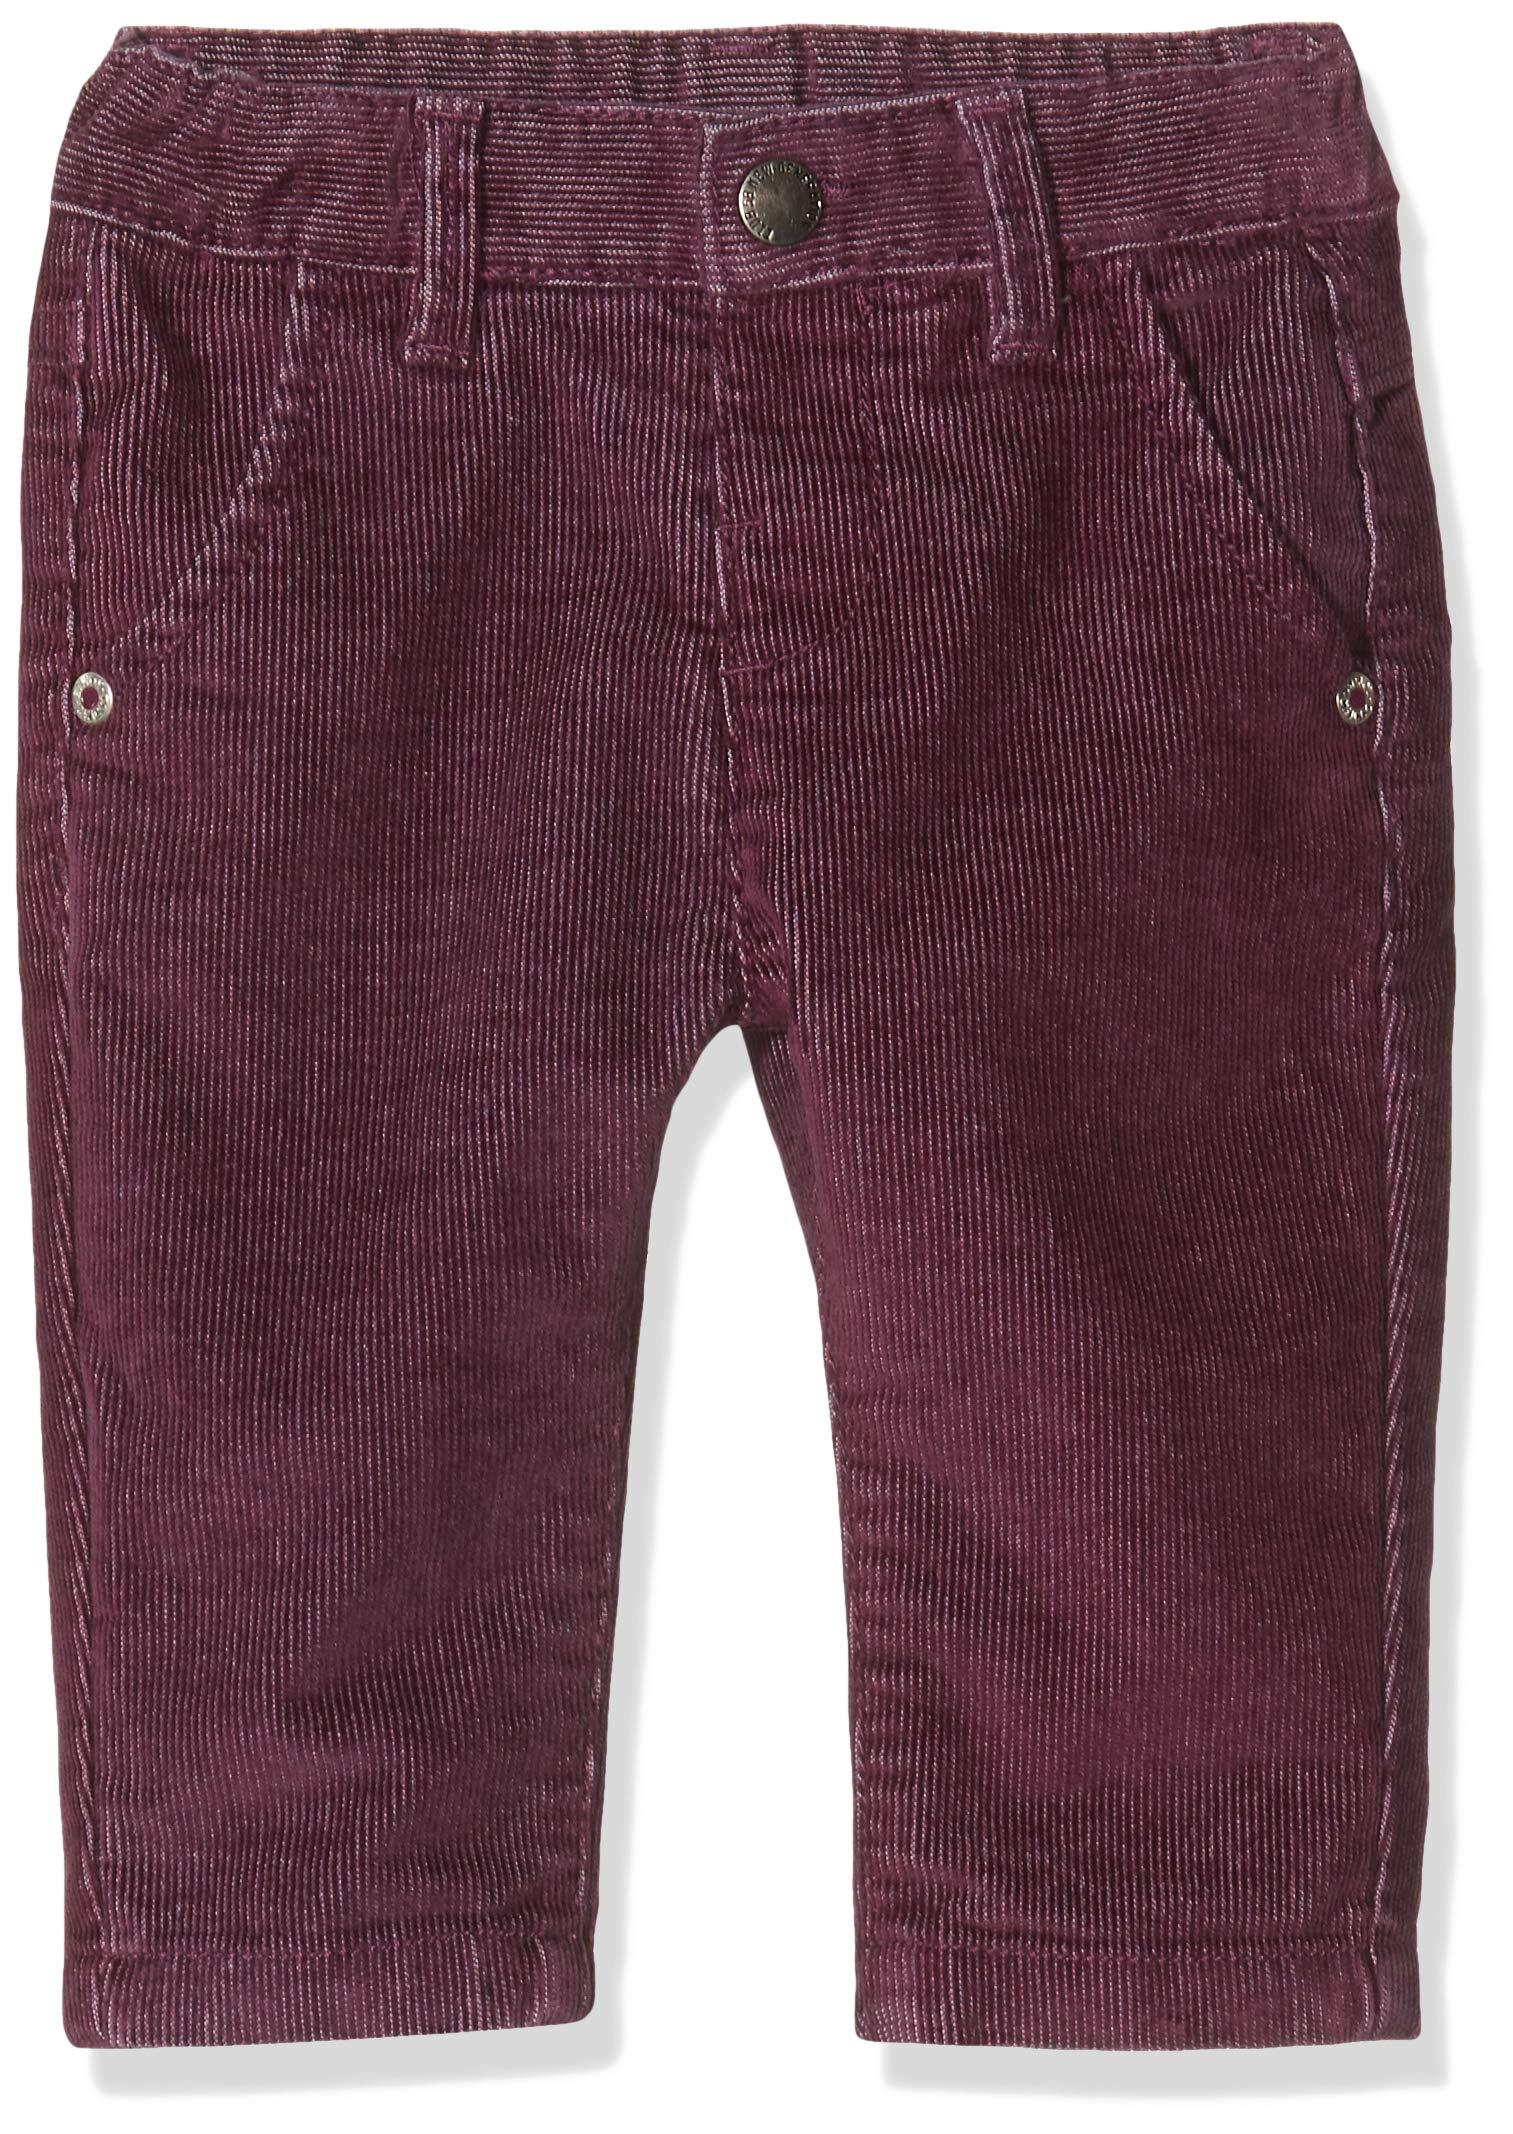 Chicco Pantaloni Lunghi Pantalones para Bebés 1